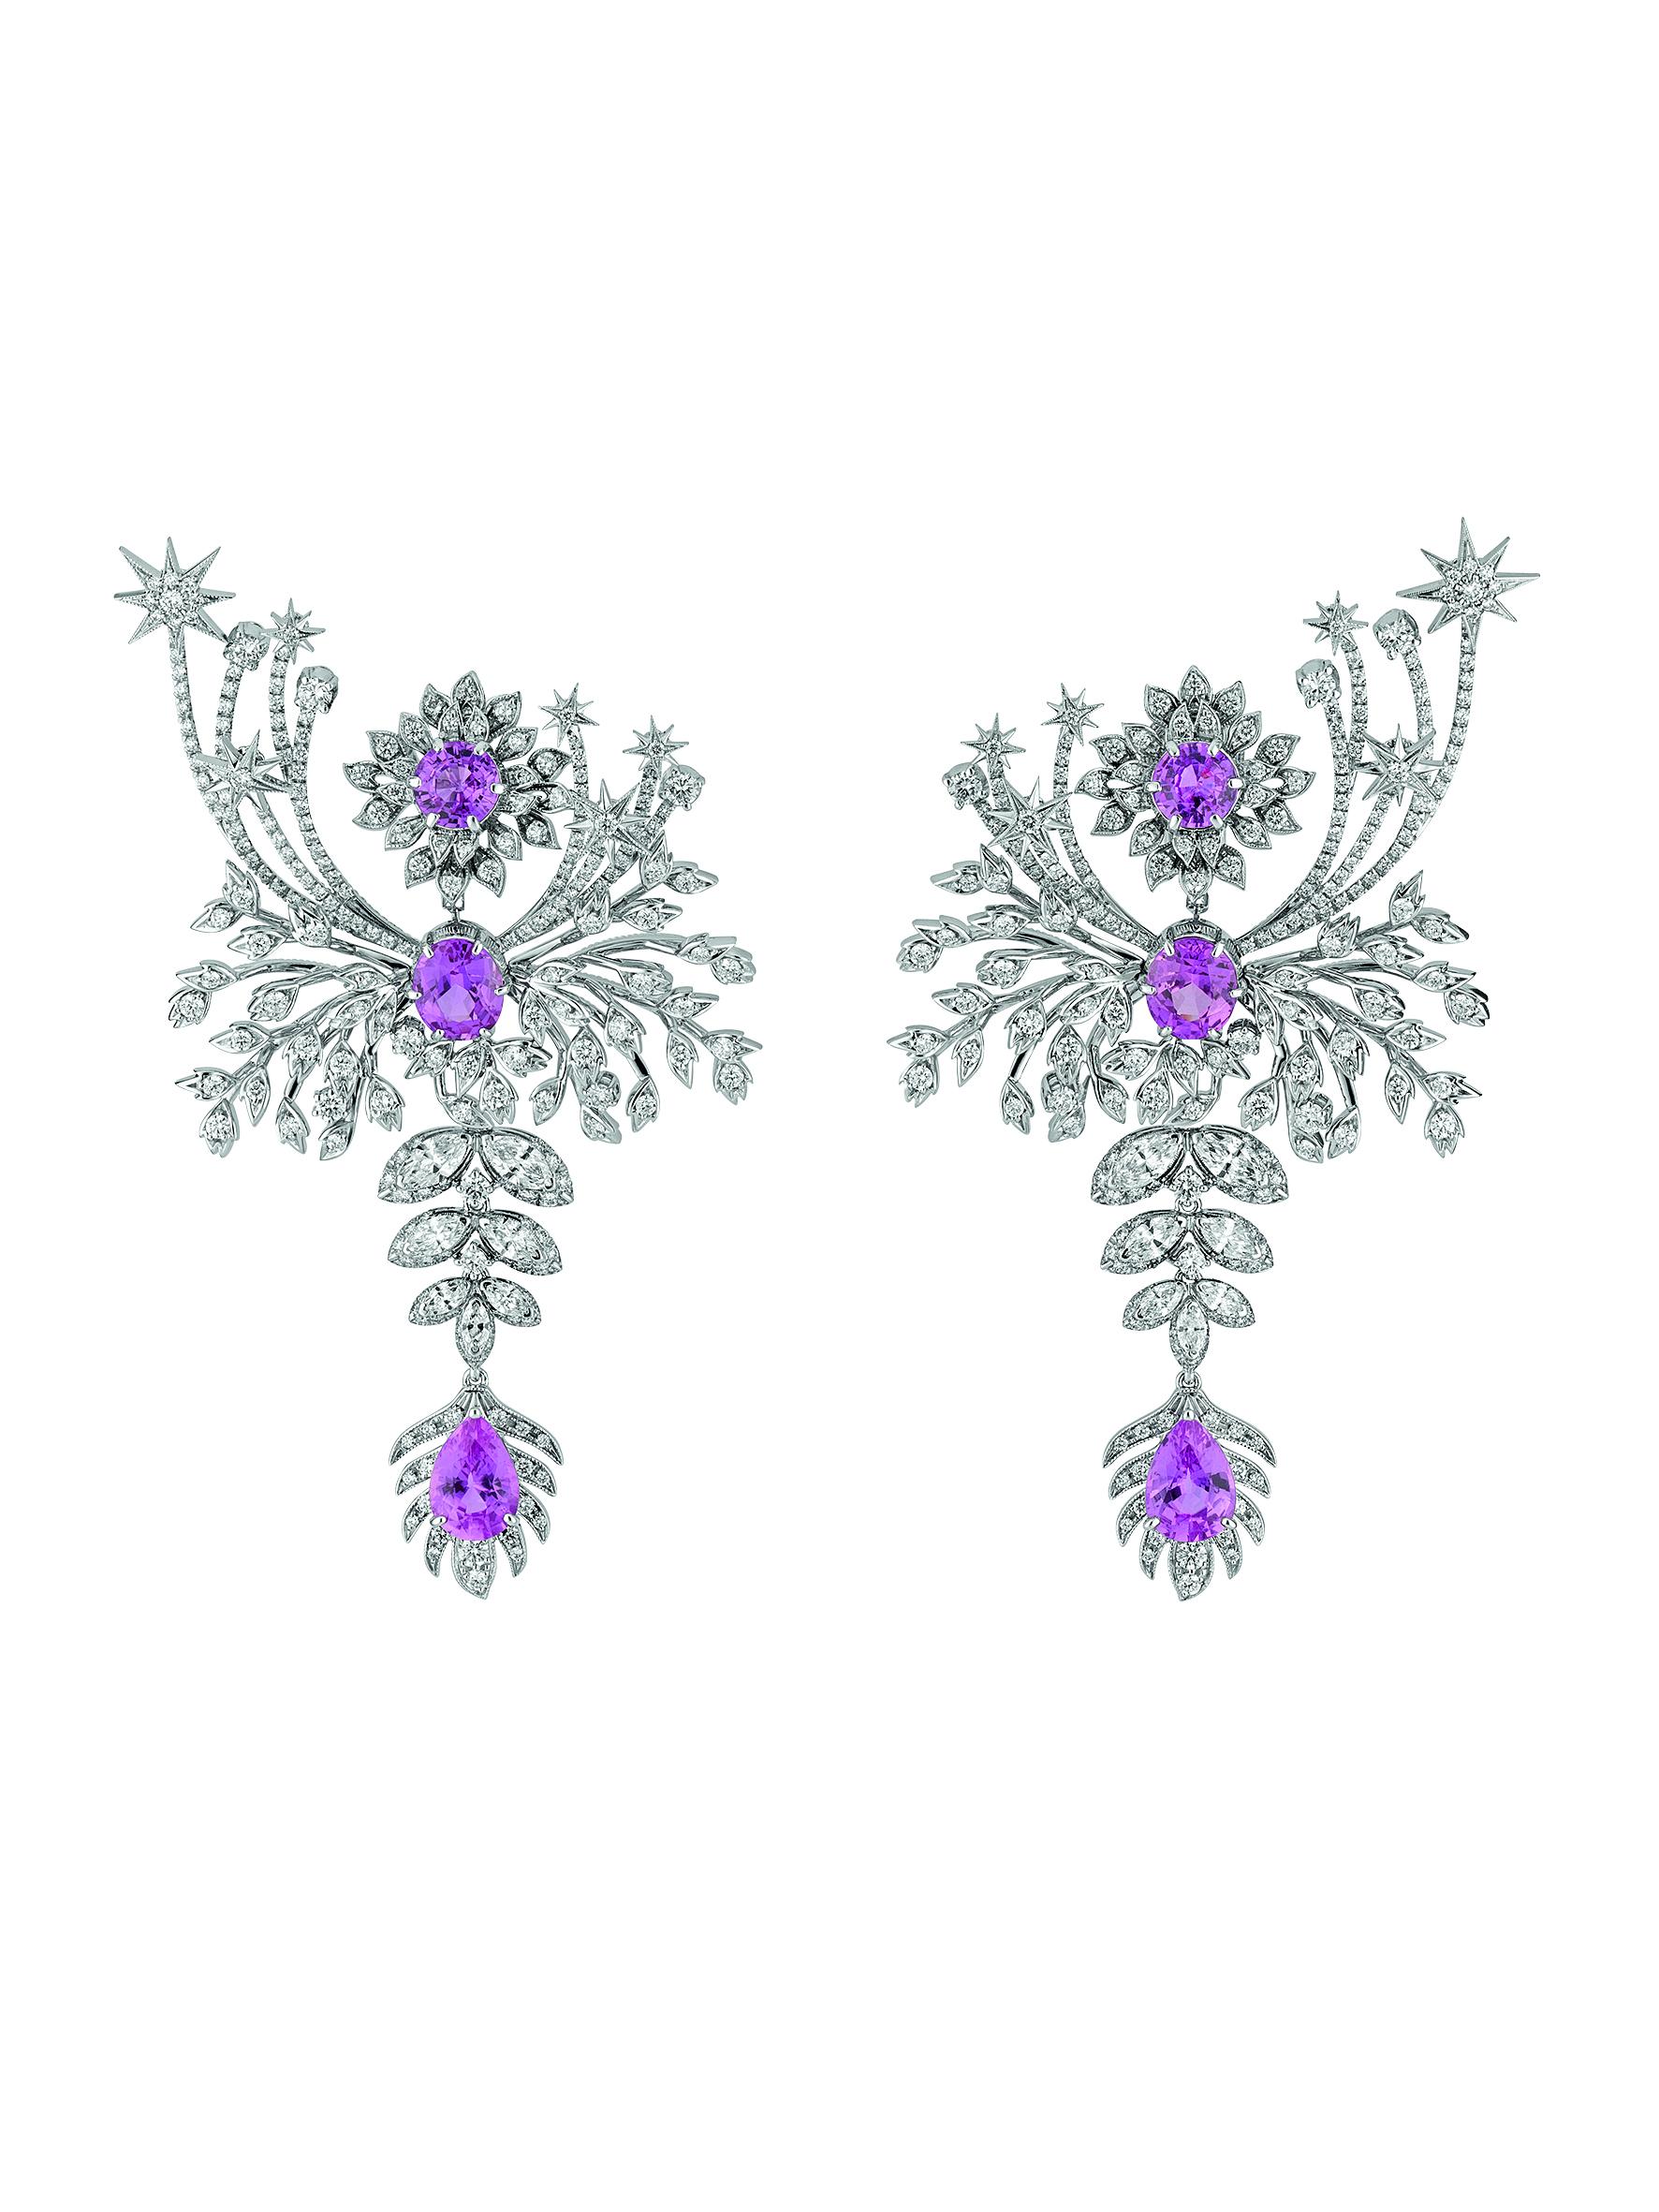 Jodie Turner-Smith Gucci High Jewelry